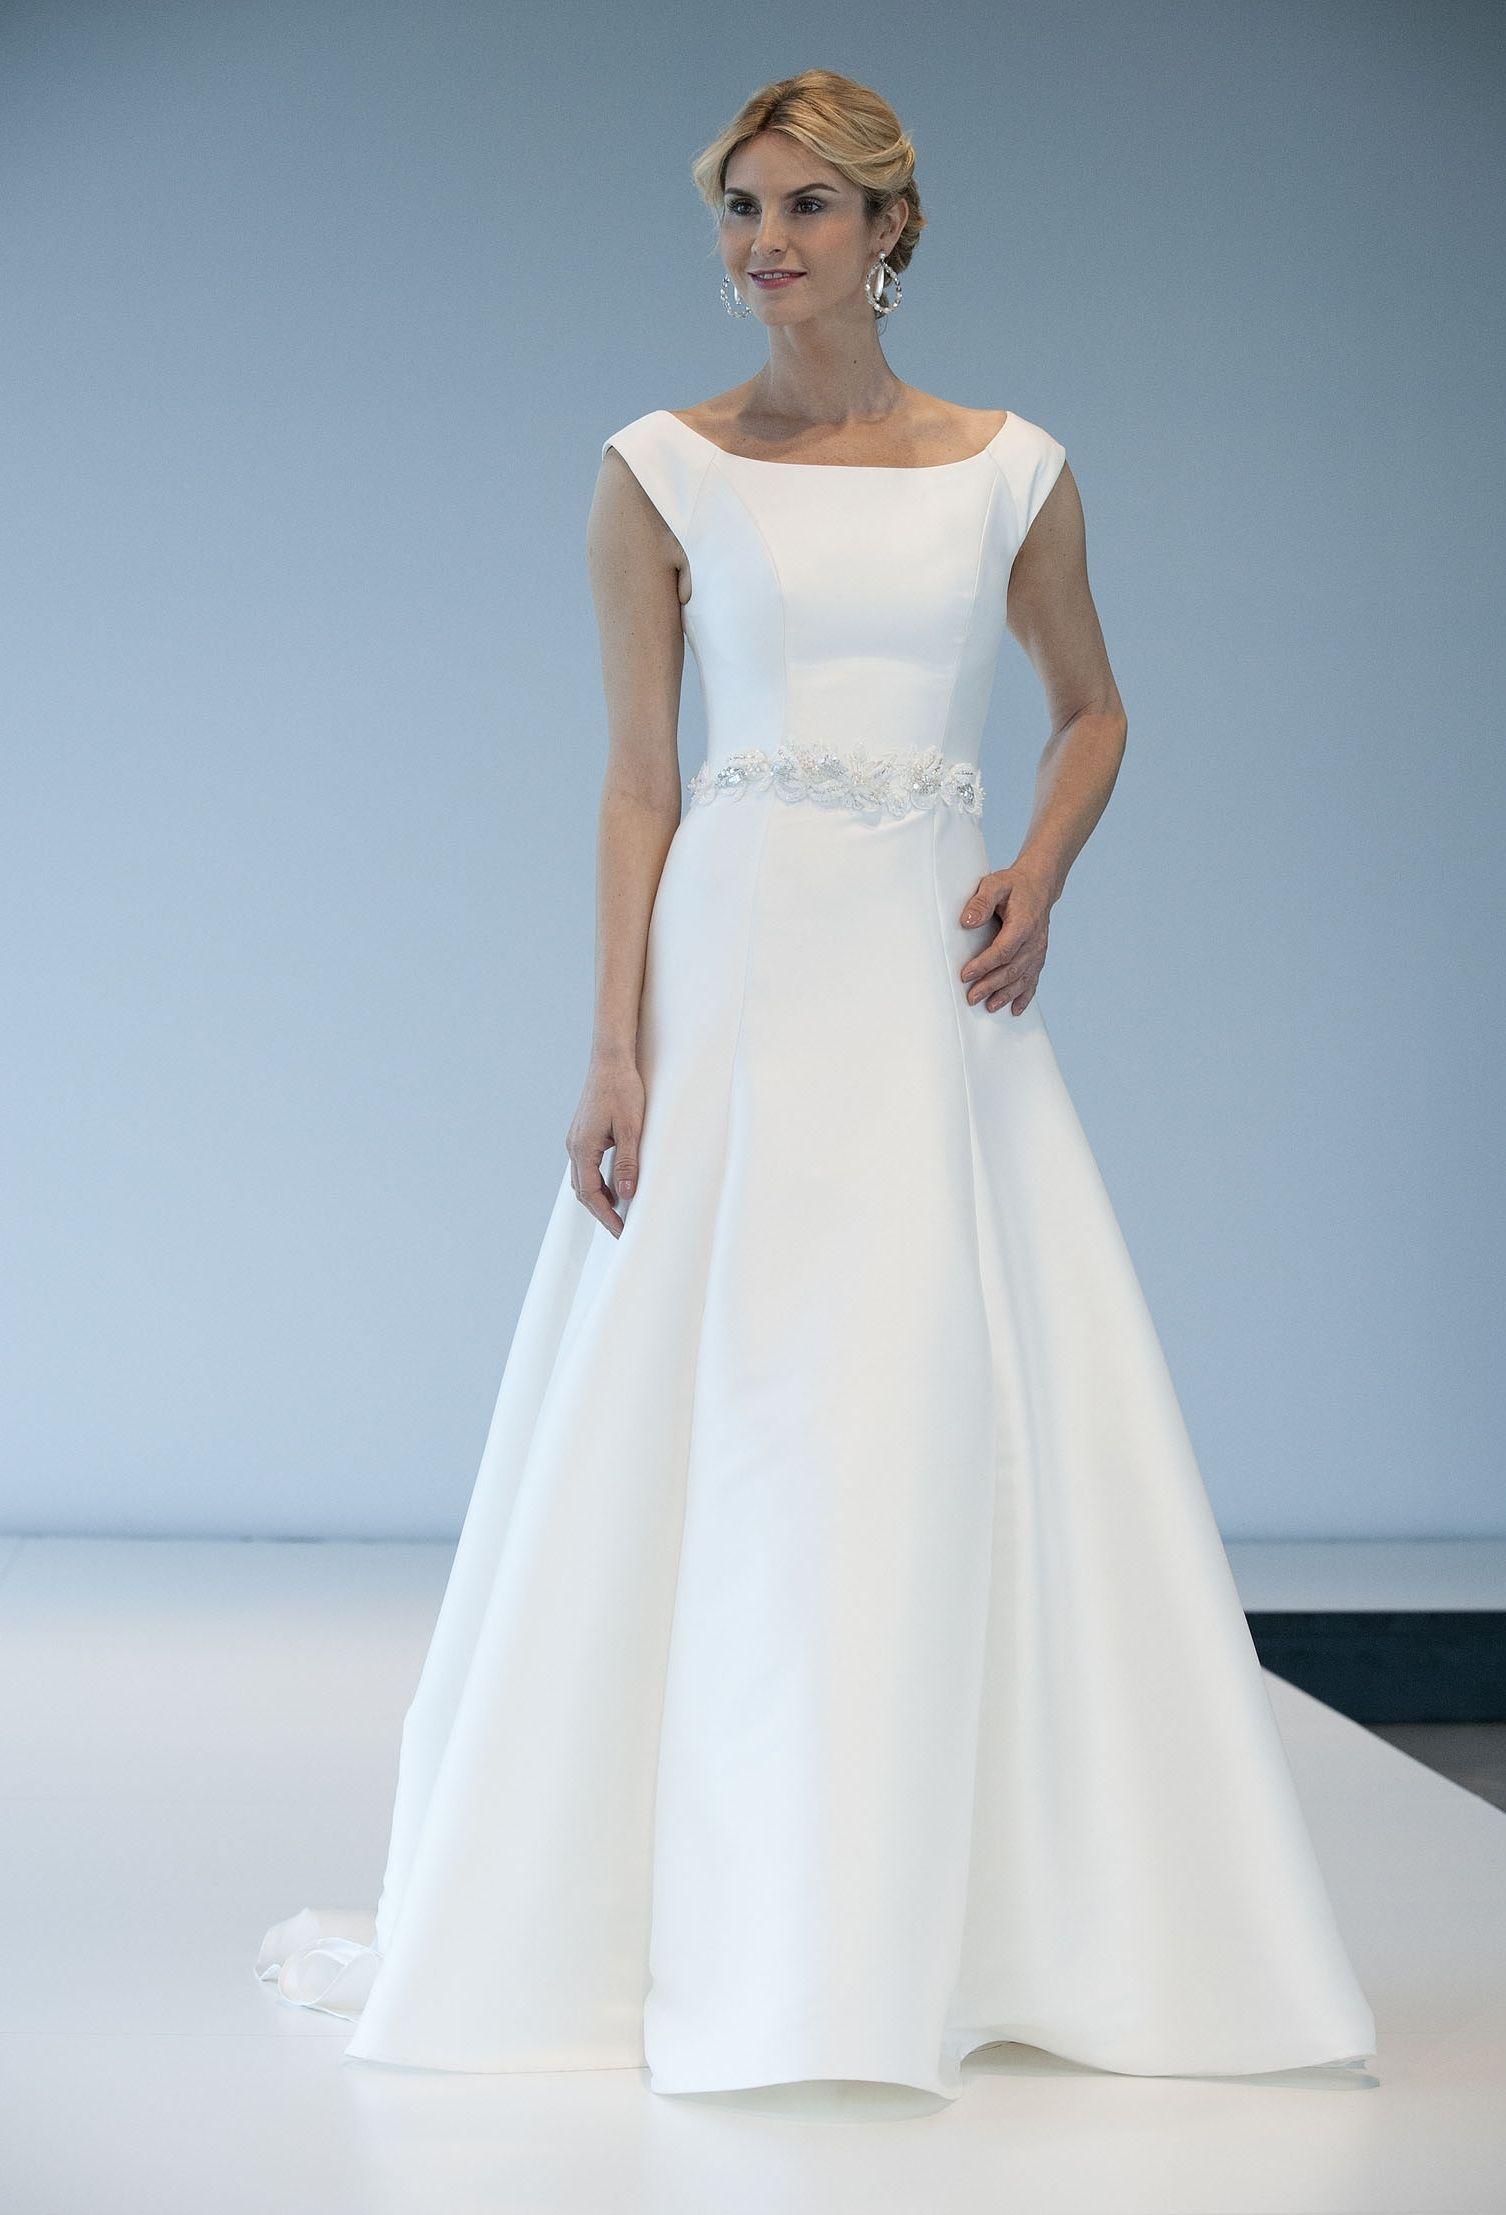 Wedding Dresses Denver | Wedding Dress | Pinterest | Wedding dresses ...